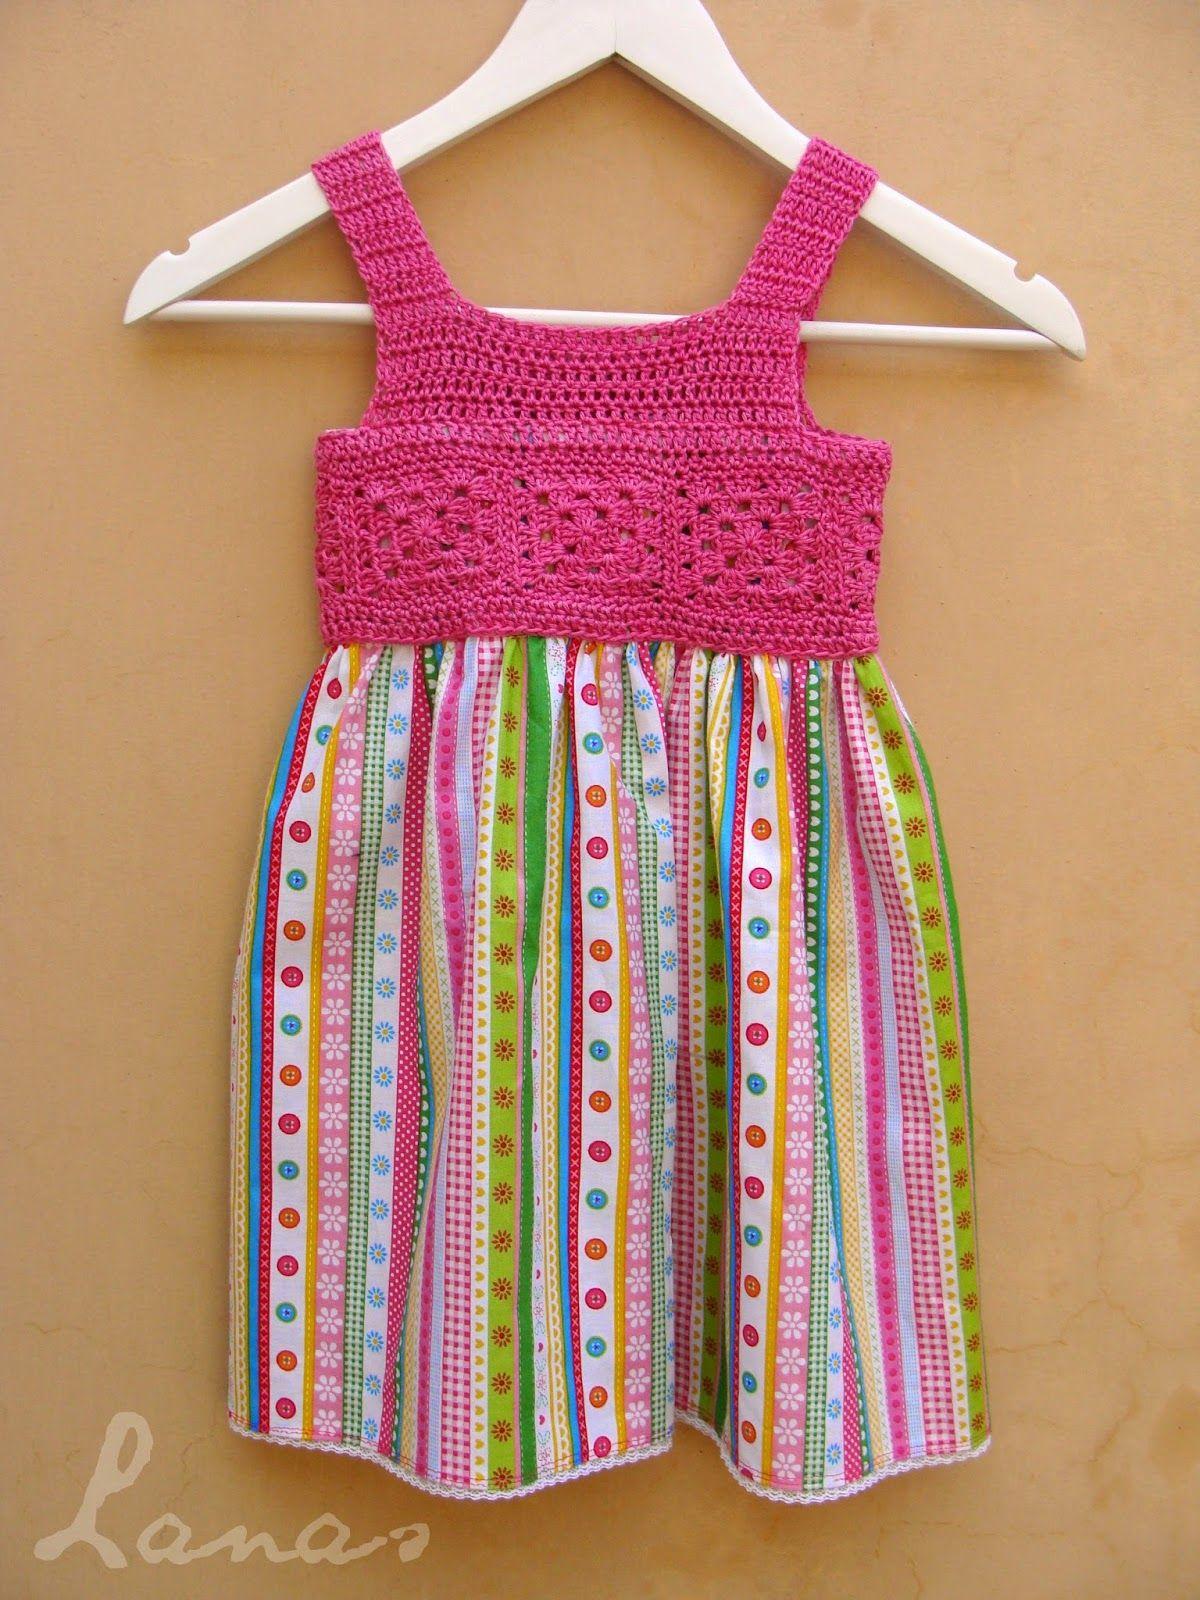 Free crochet pattern for bodice of toddler dress crafts free crochet pattern for bodice of toddler dress bankloansurffo Gallery